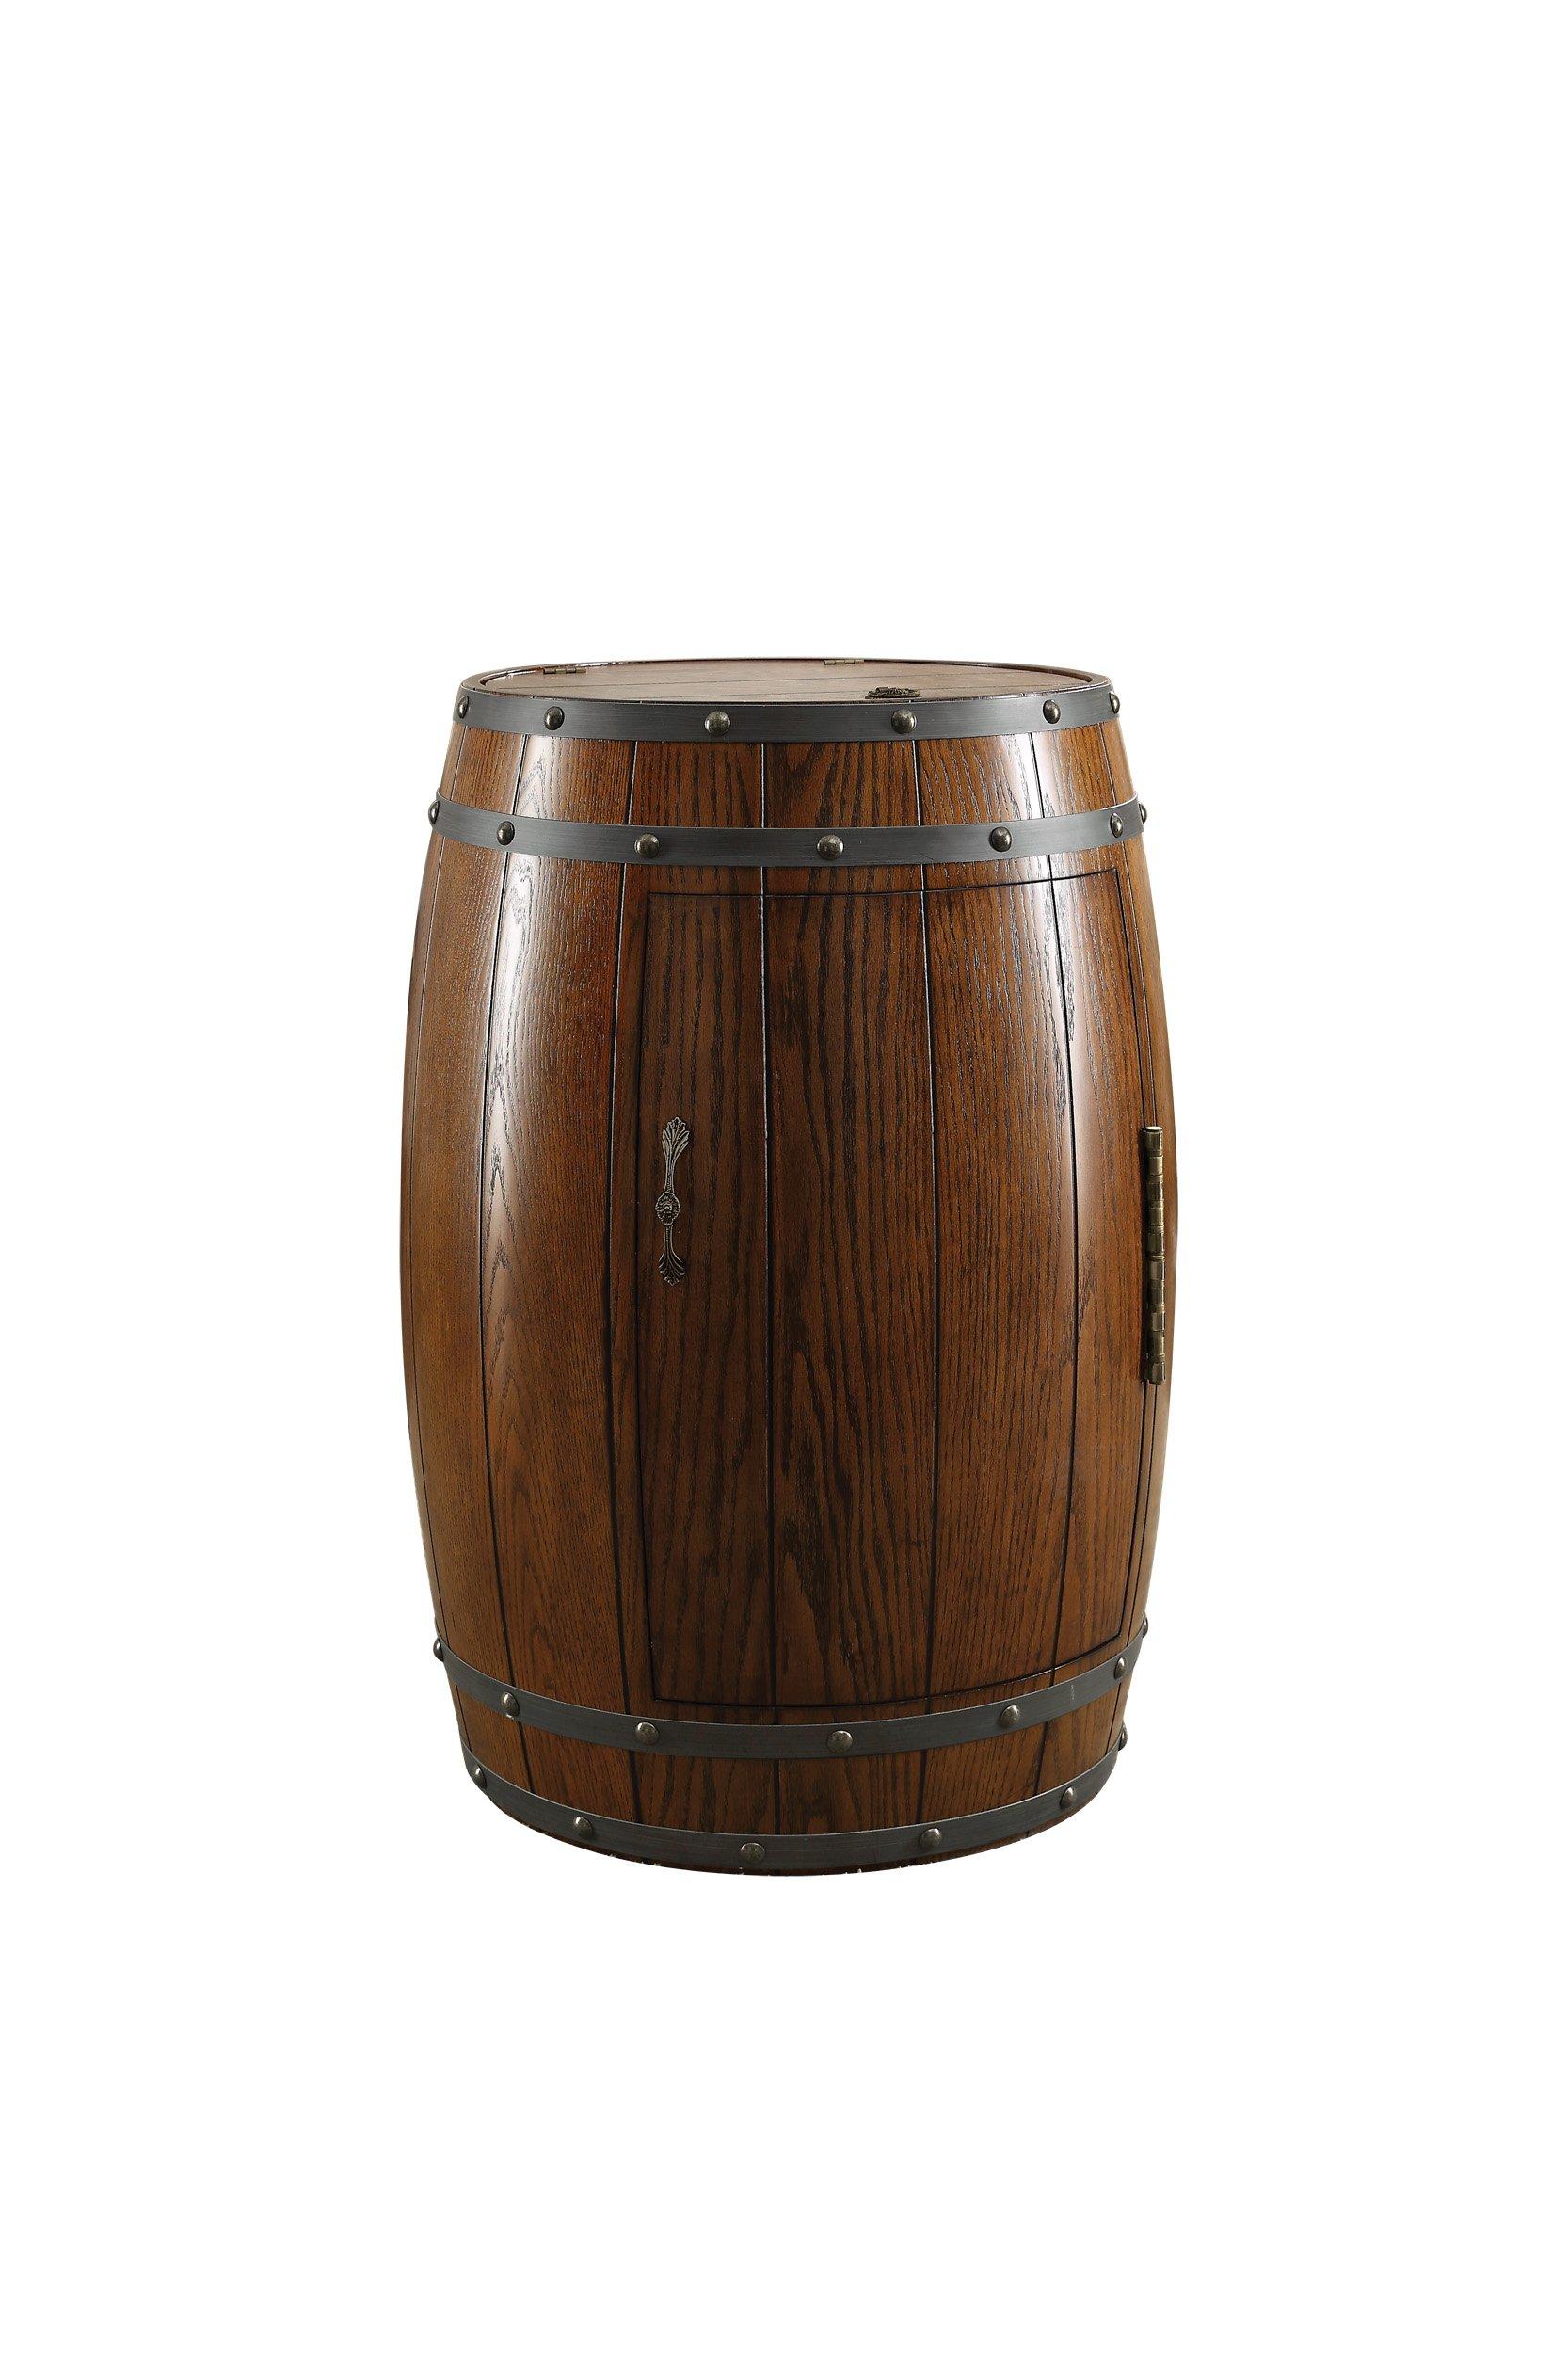 Homelegance Cabernet Wine Cooler Barrel with Temperature Control, Oak